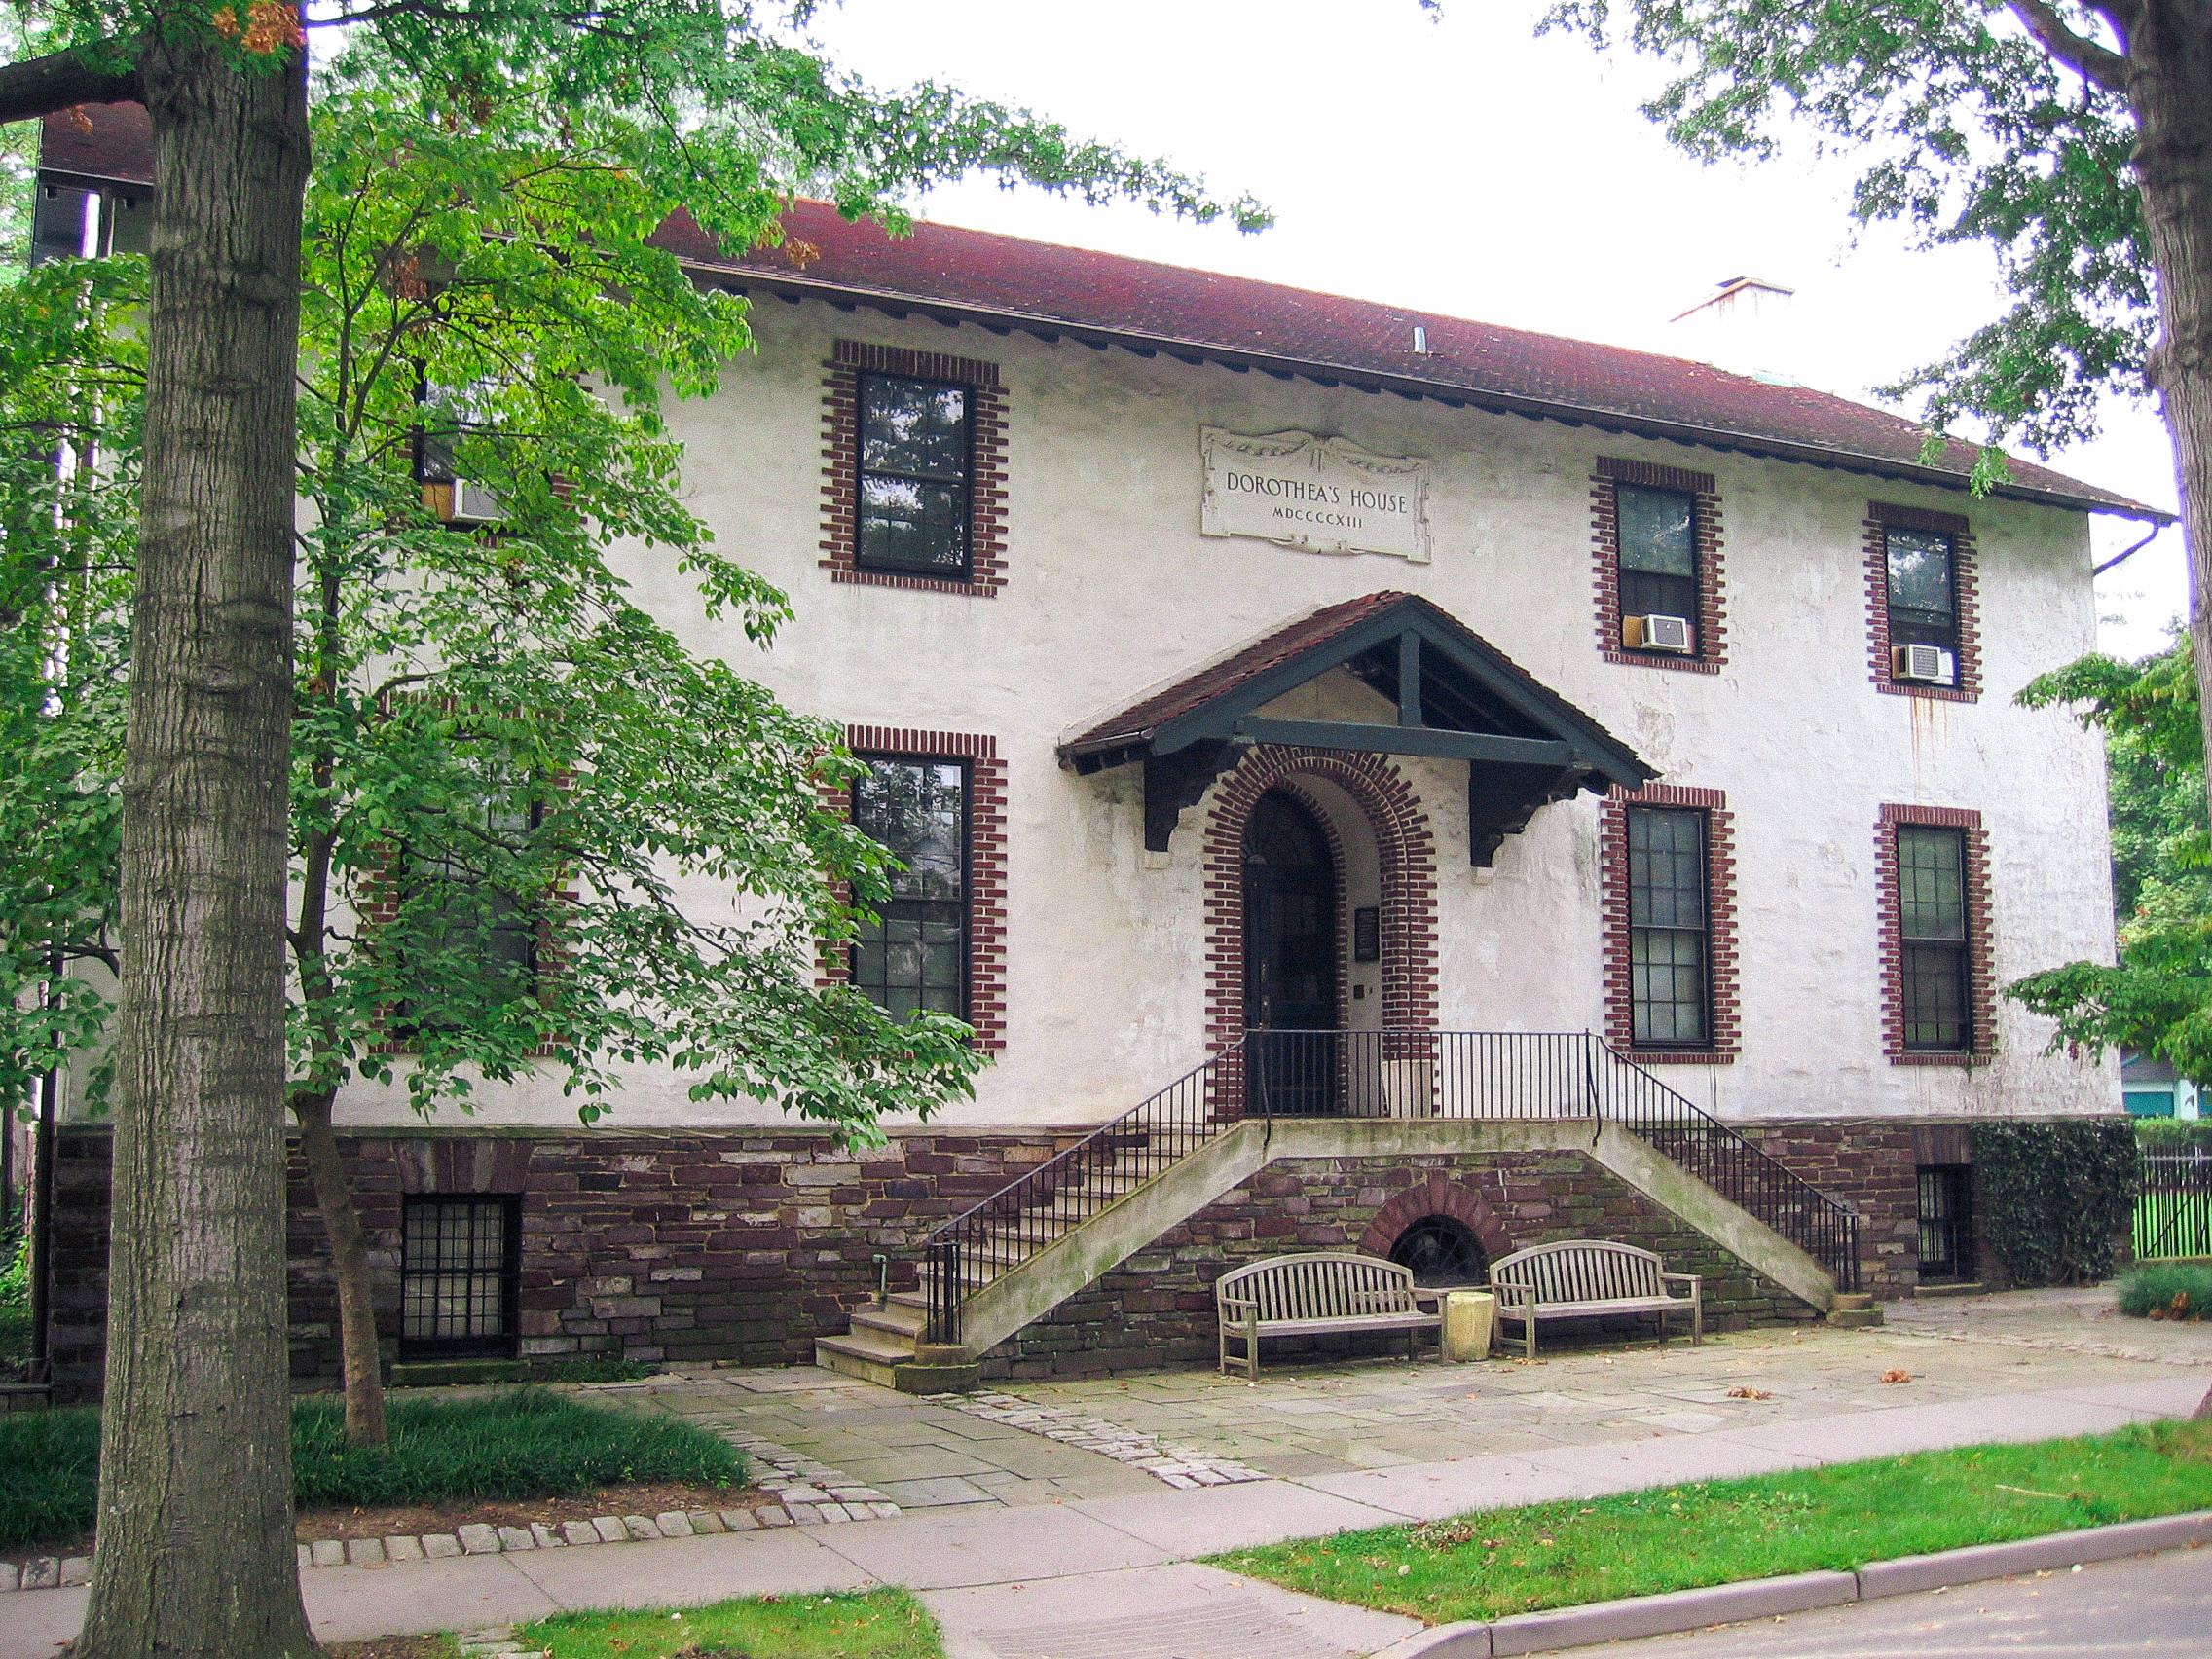 Dorothea's House Exterior